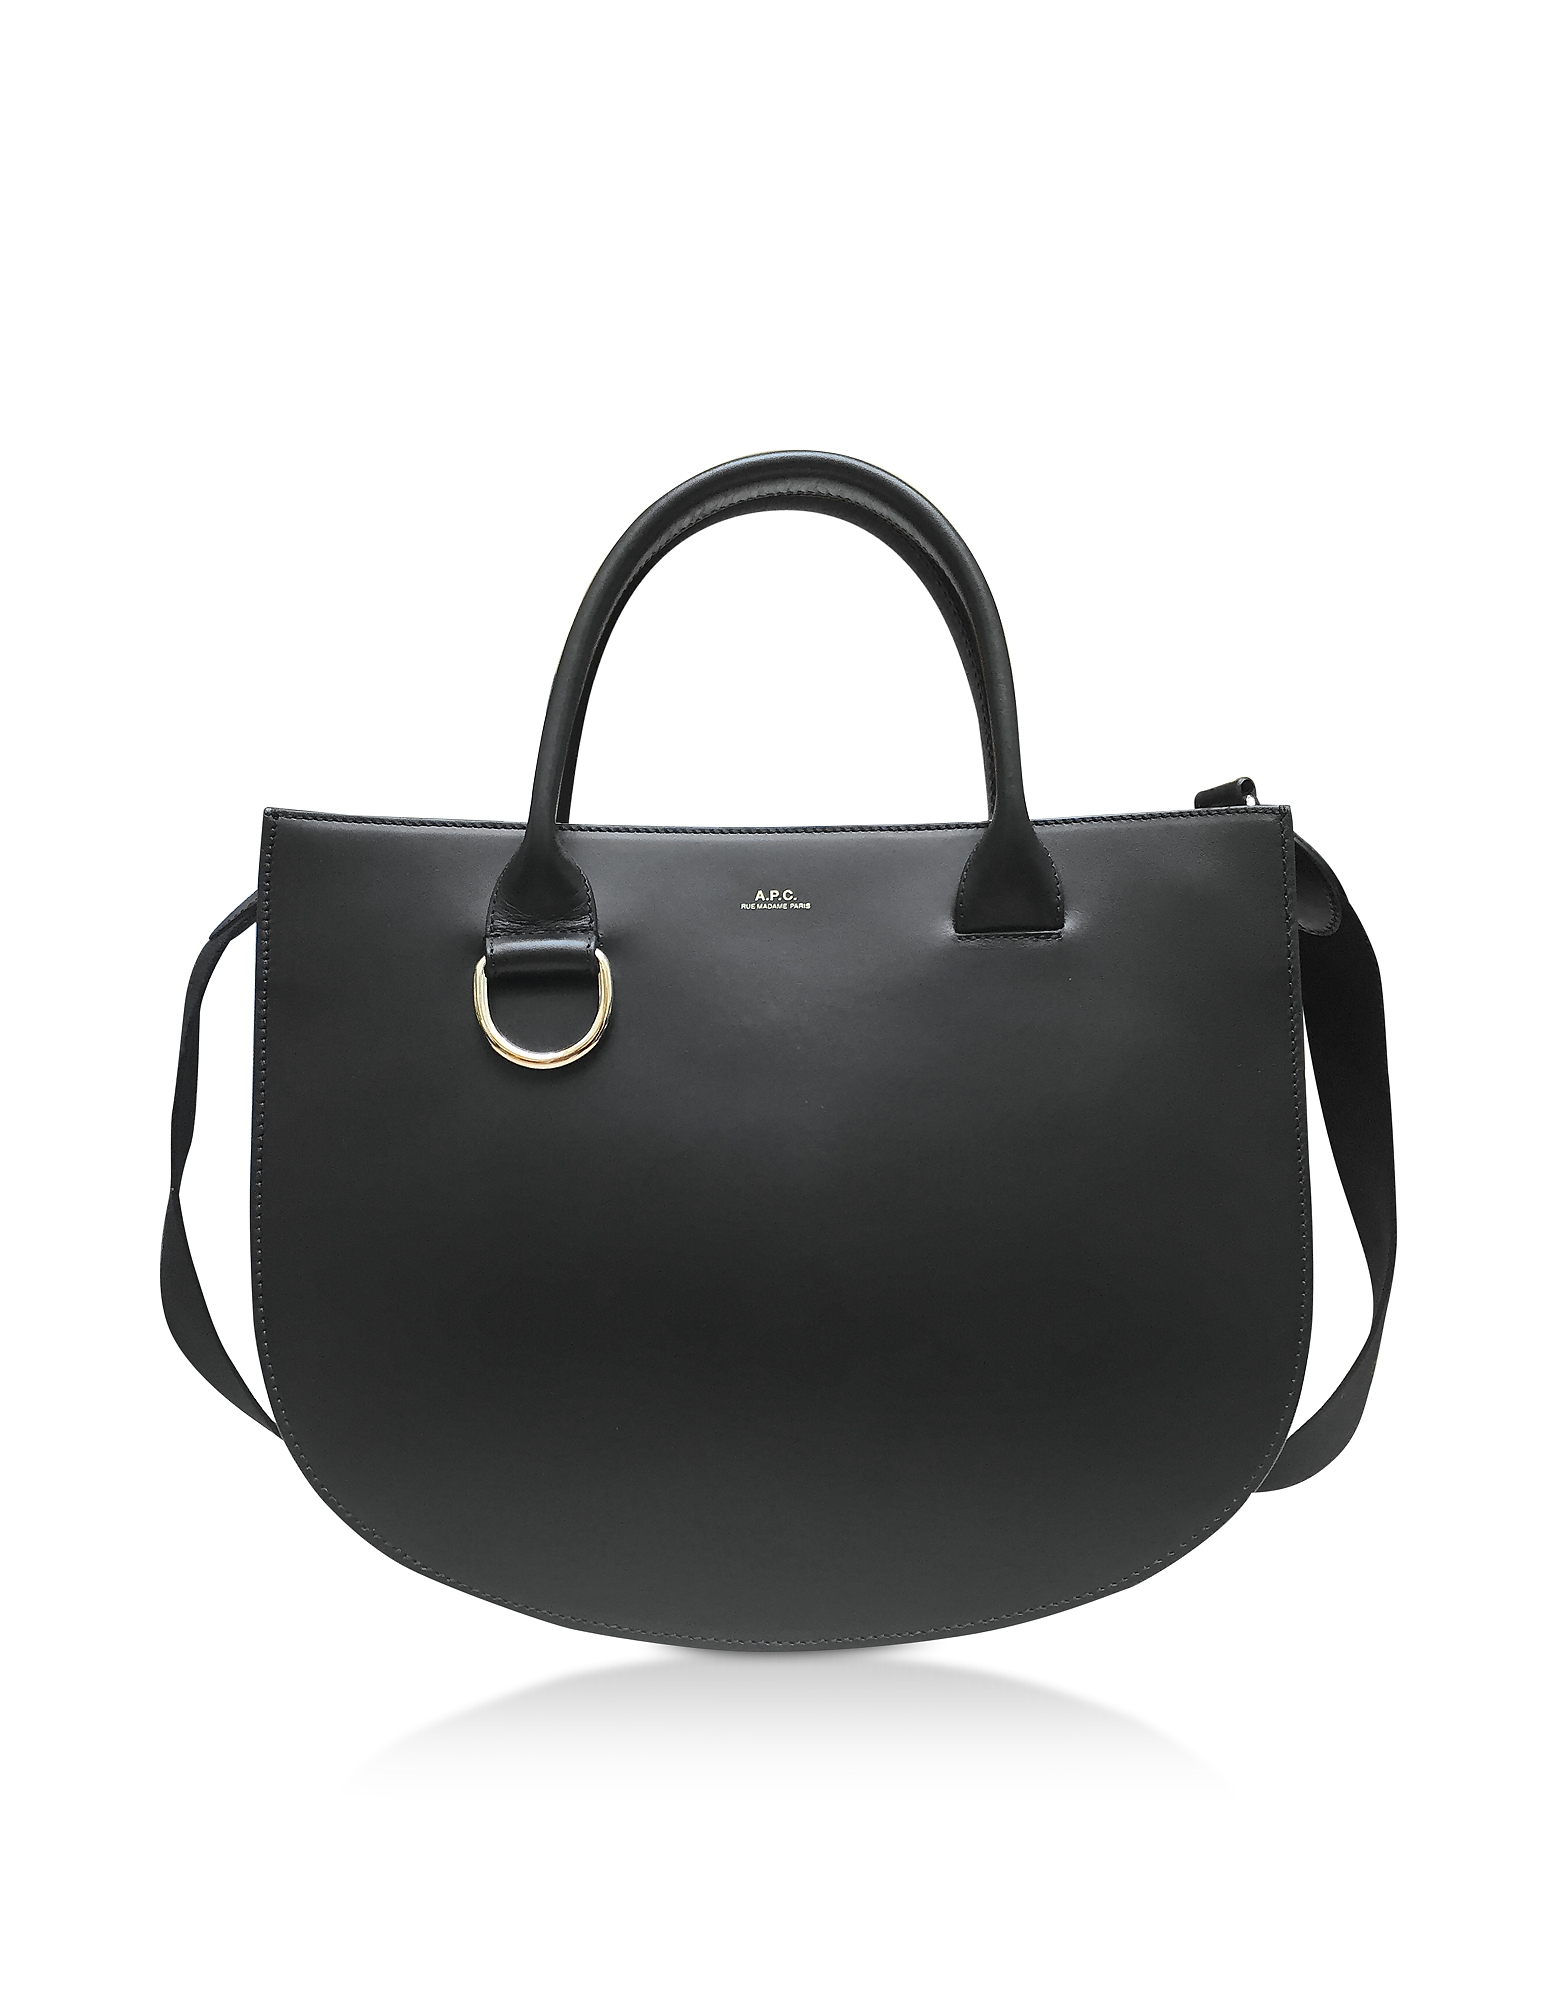 Marion Black Leather Tote Bag